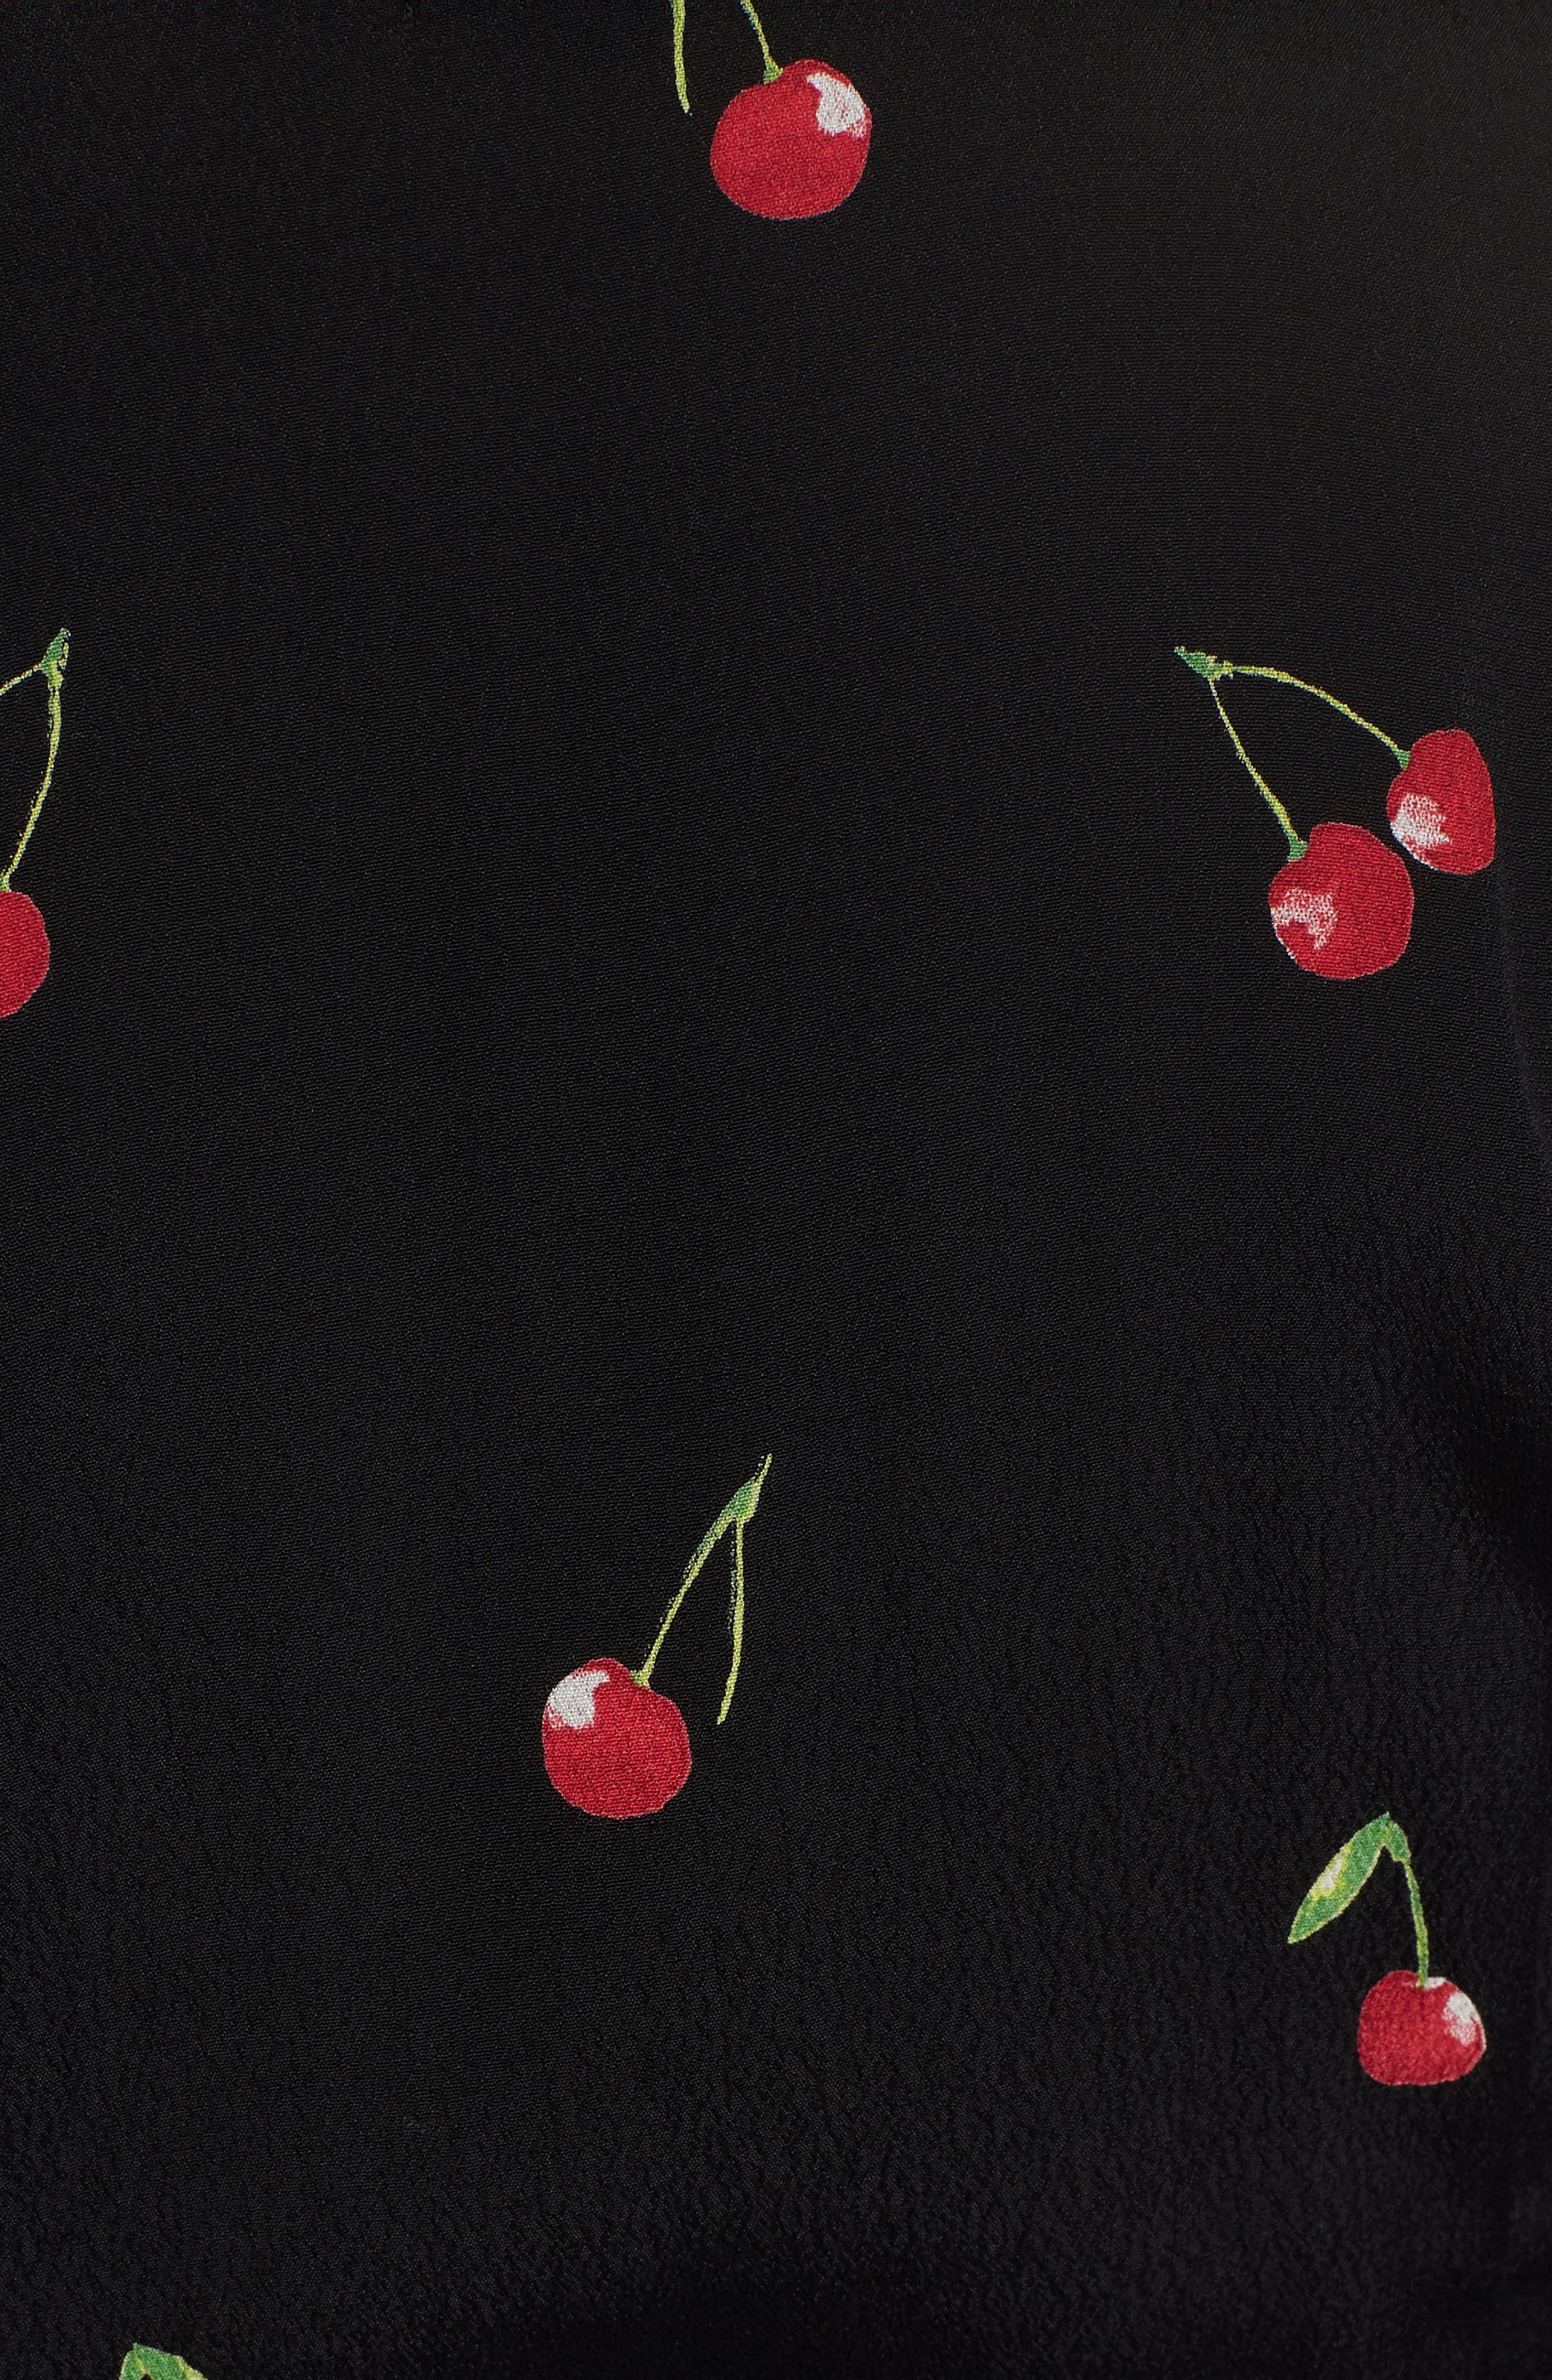 Lola Cherry Print Wrap Dress,                             Alternate thumbnail 6, color,                             CERISE